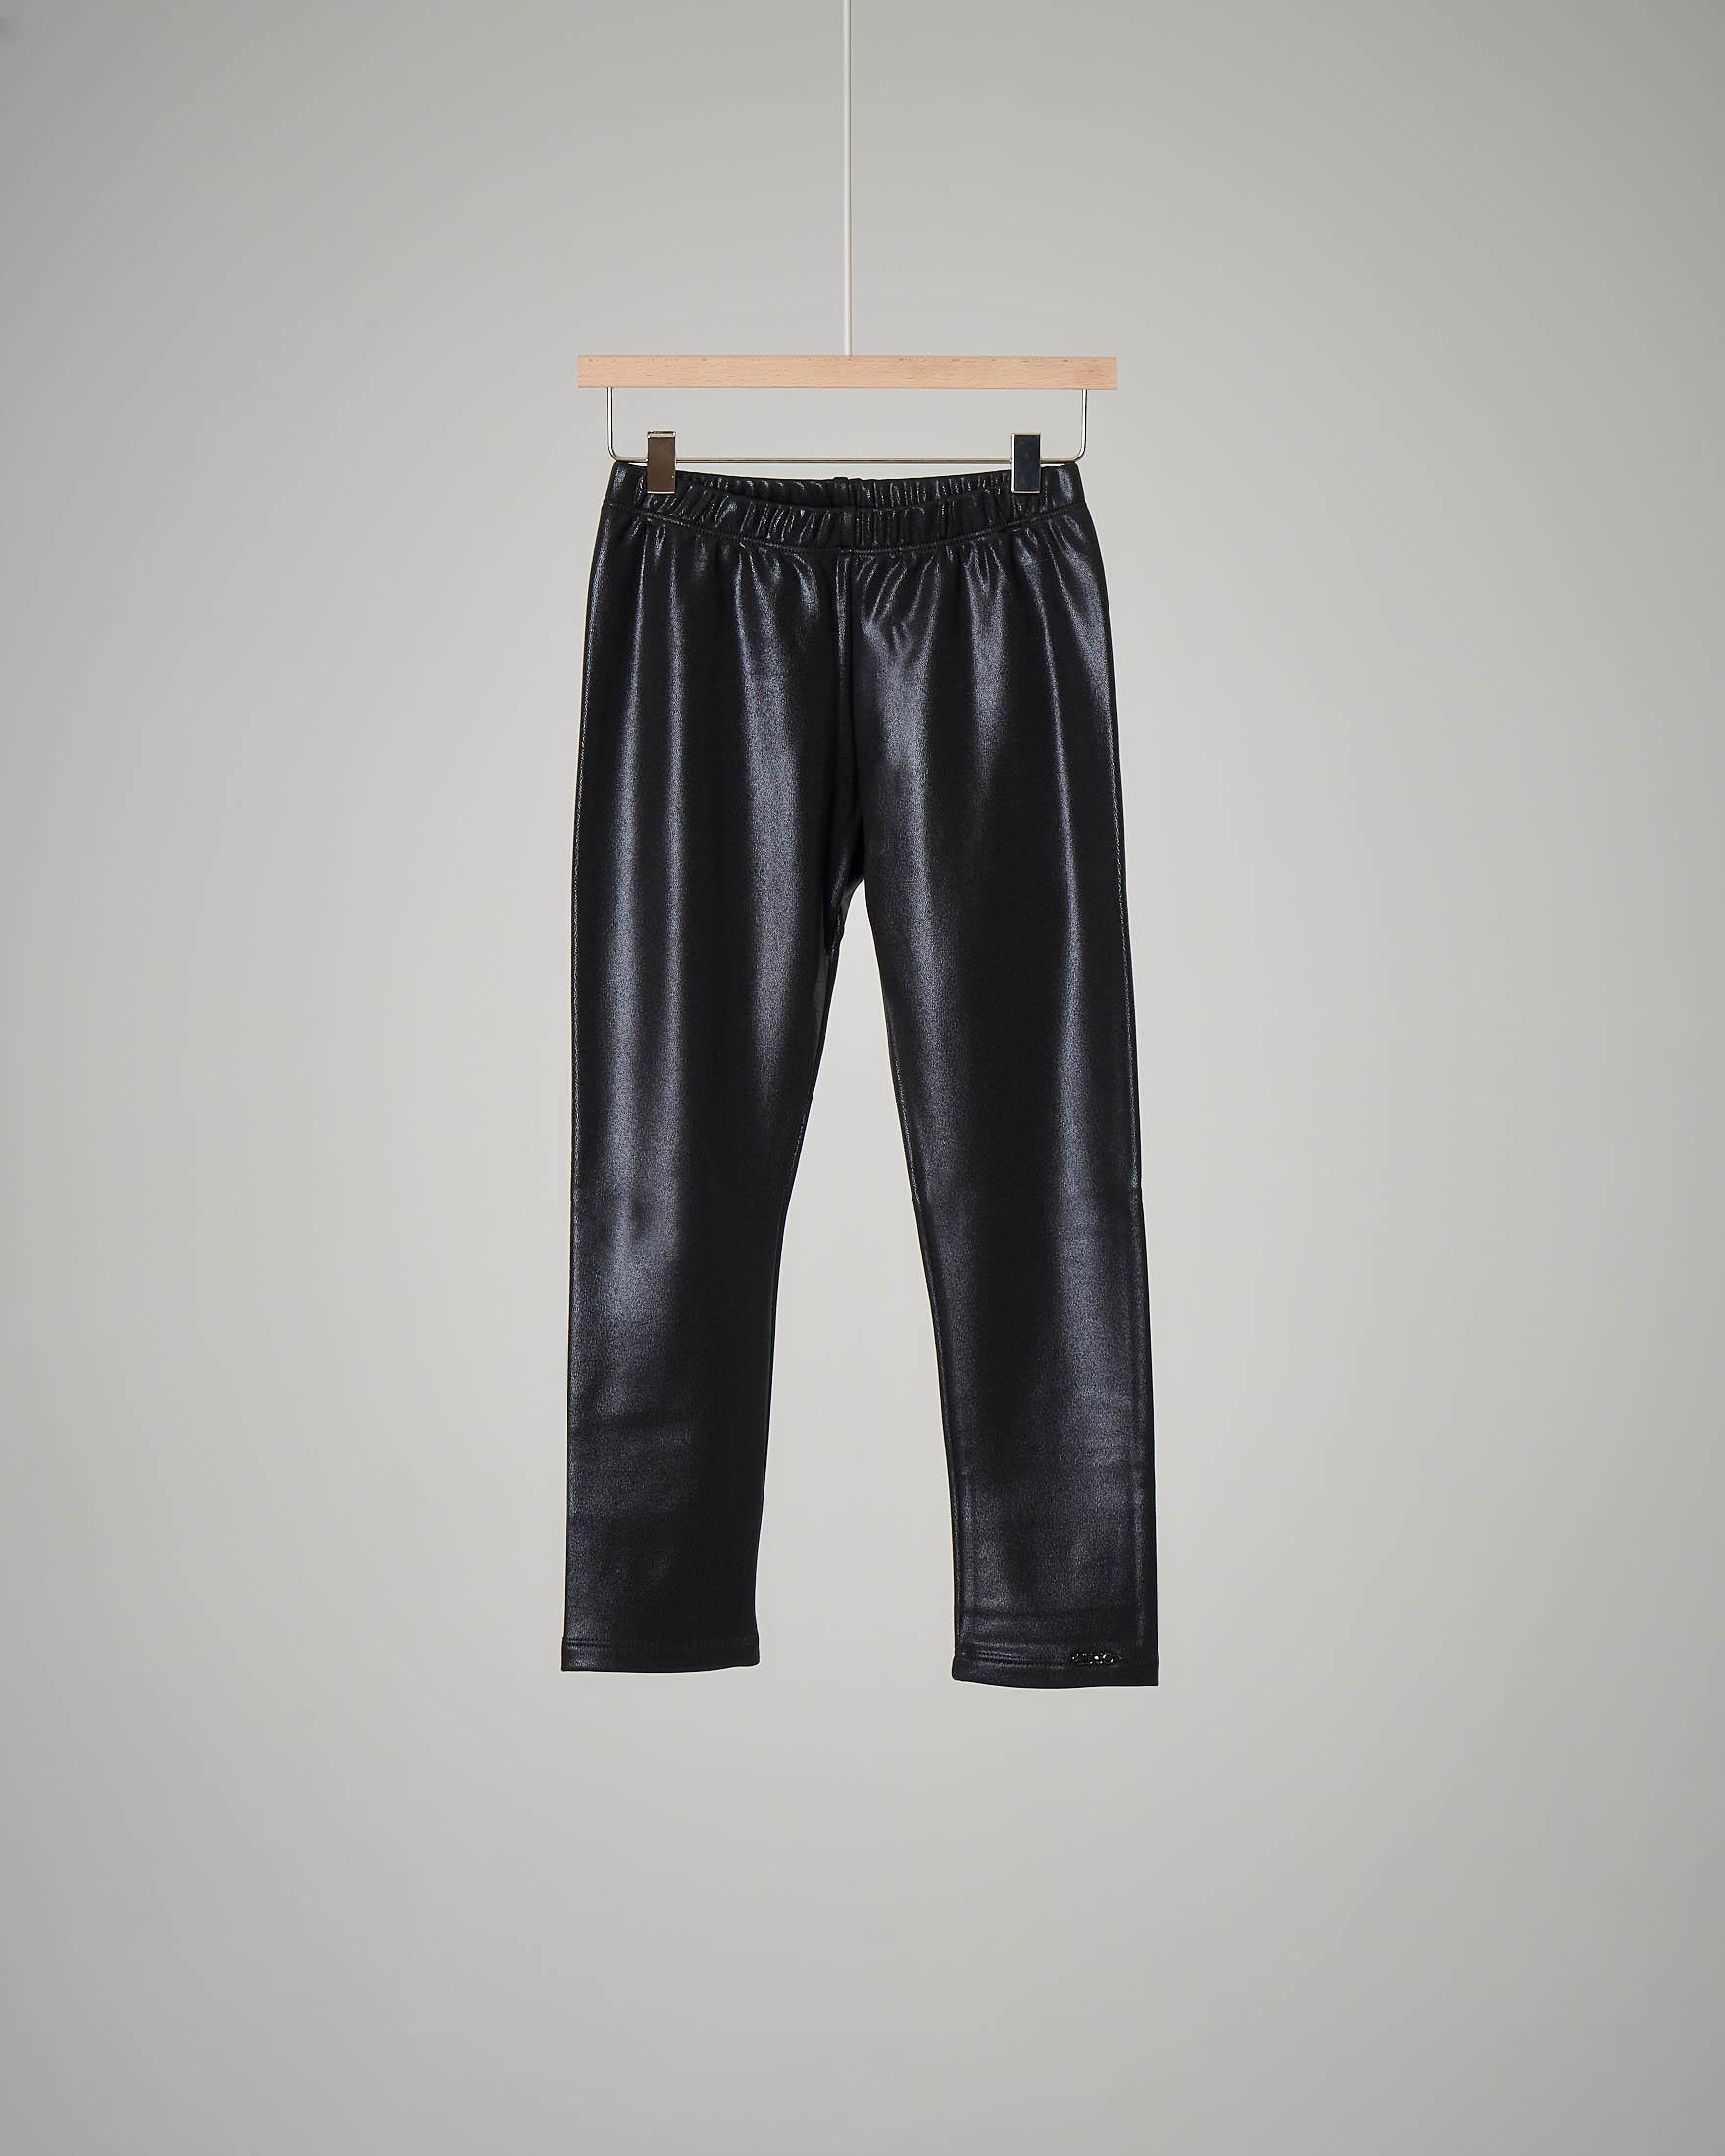 Pantalone nero leggins